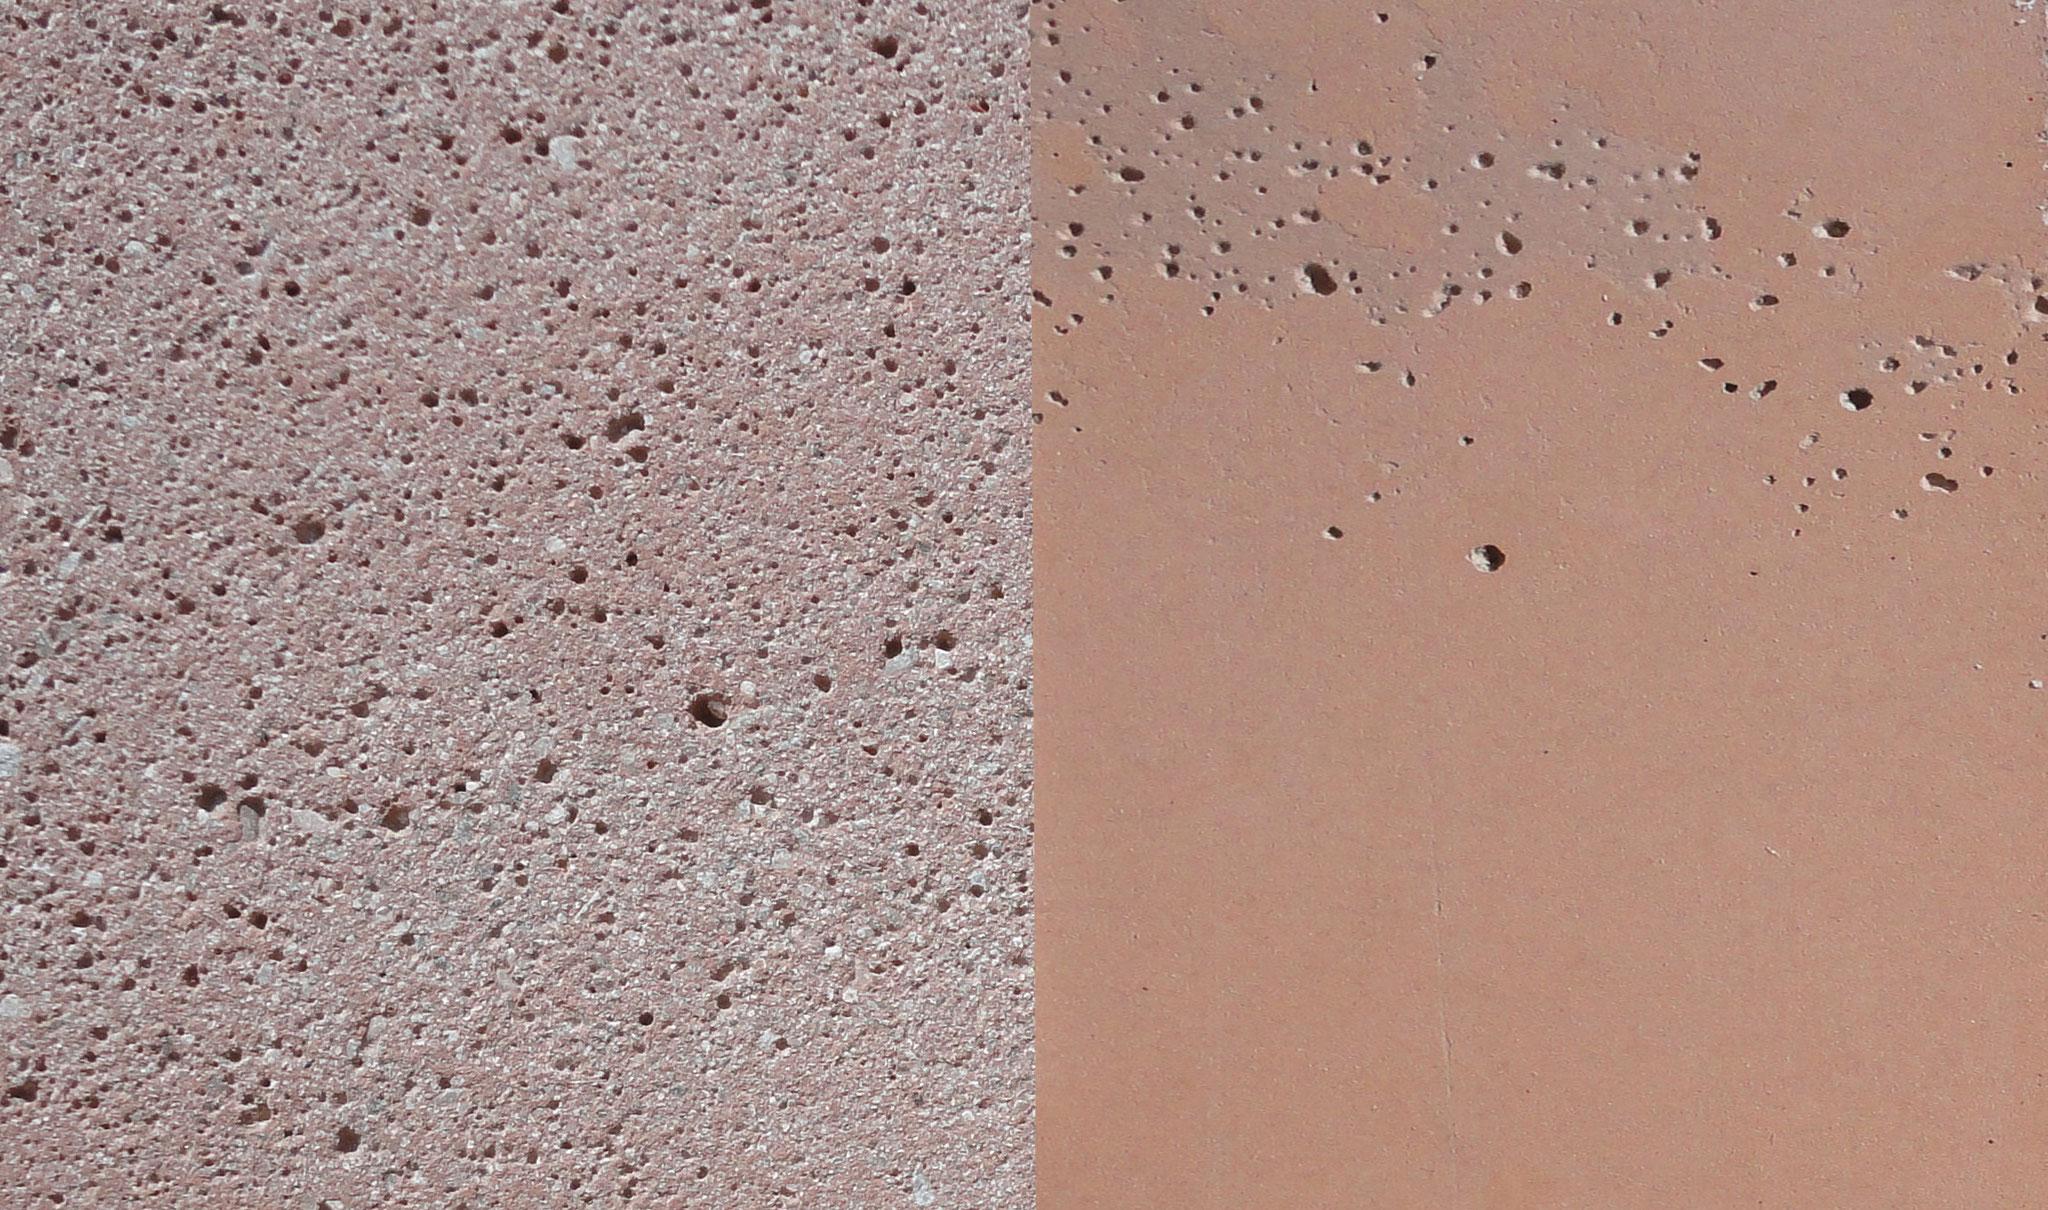 Farbe: ocker-rot, Farbnummer 7, sandgestrahlt/schalrein